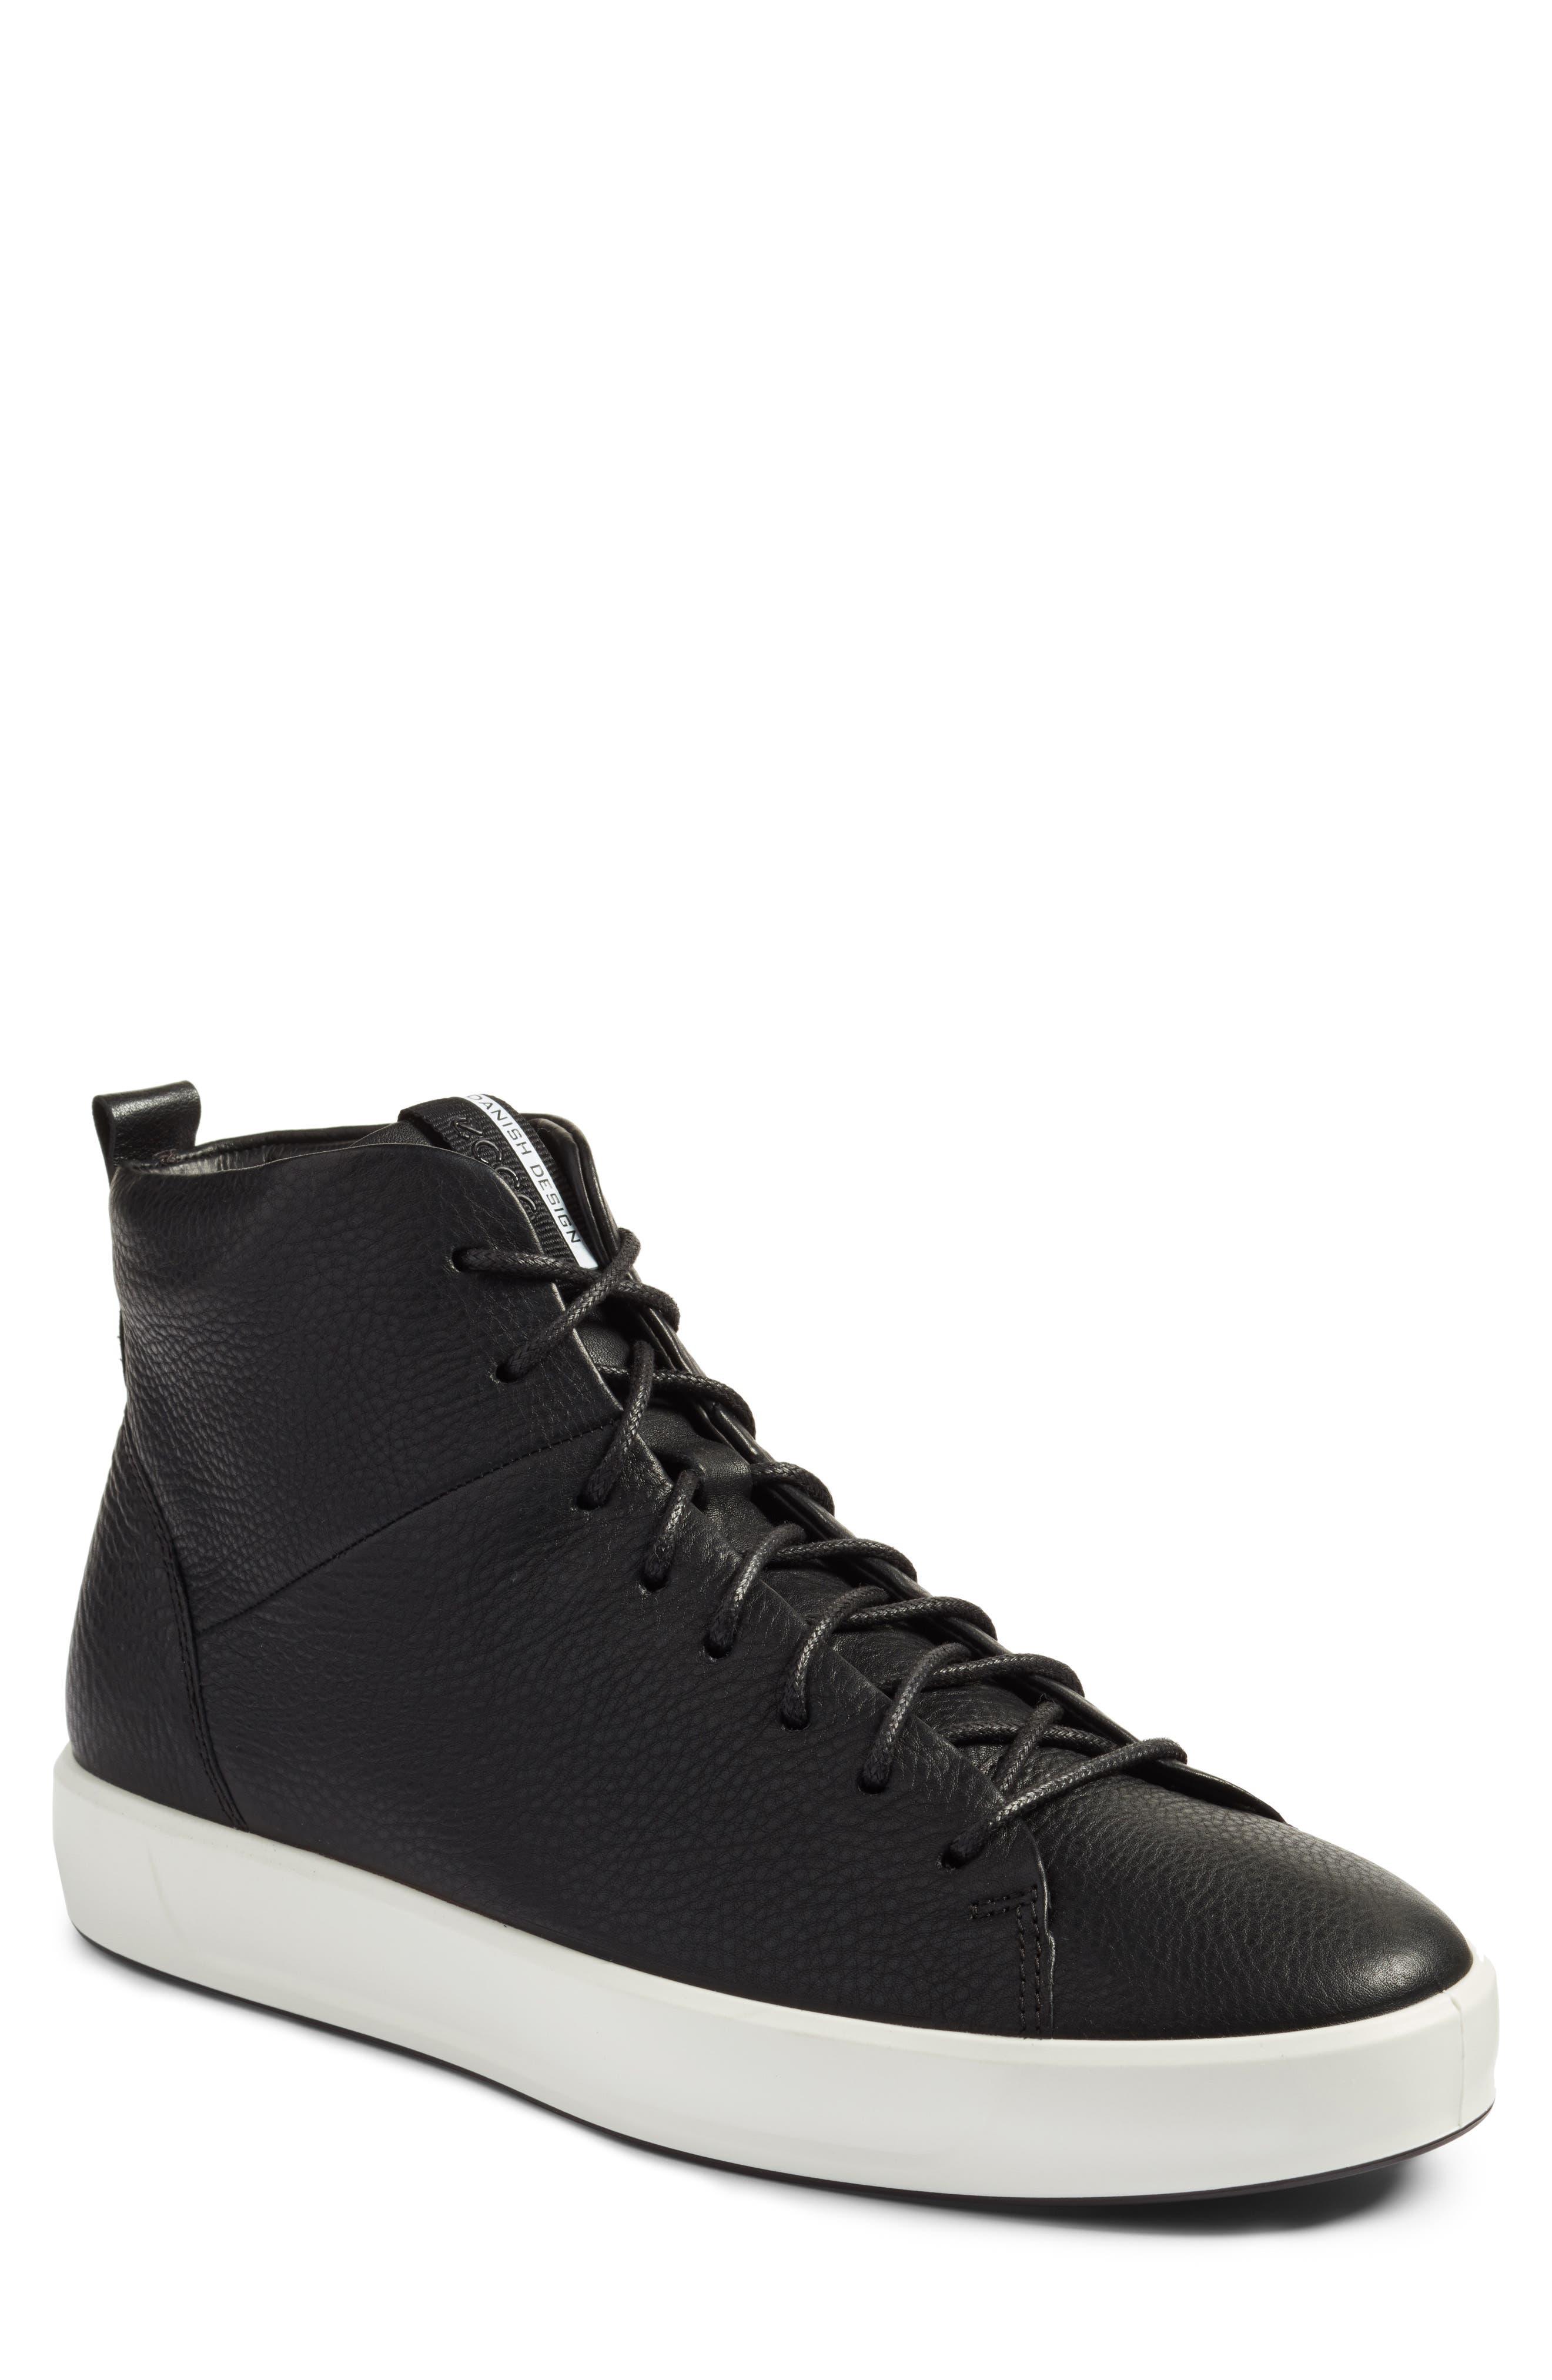 Soft 8 Sneaker,                             Main thumbnail 1, color,                             New Black